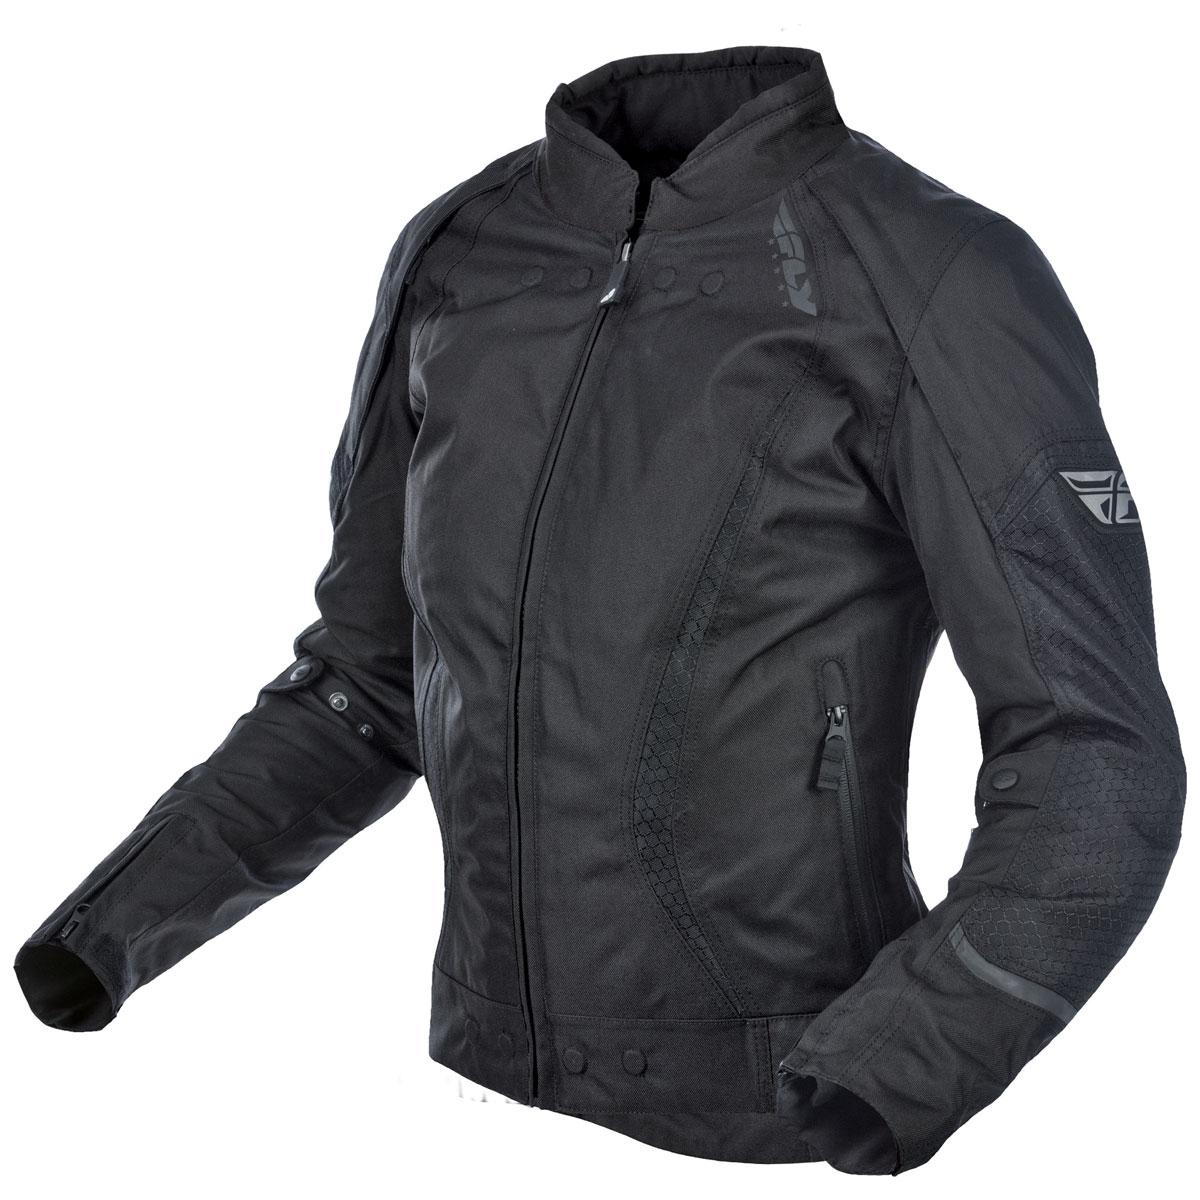 FLY Racing Street Women's Butane Black Jacket